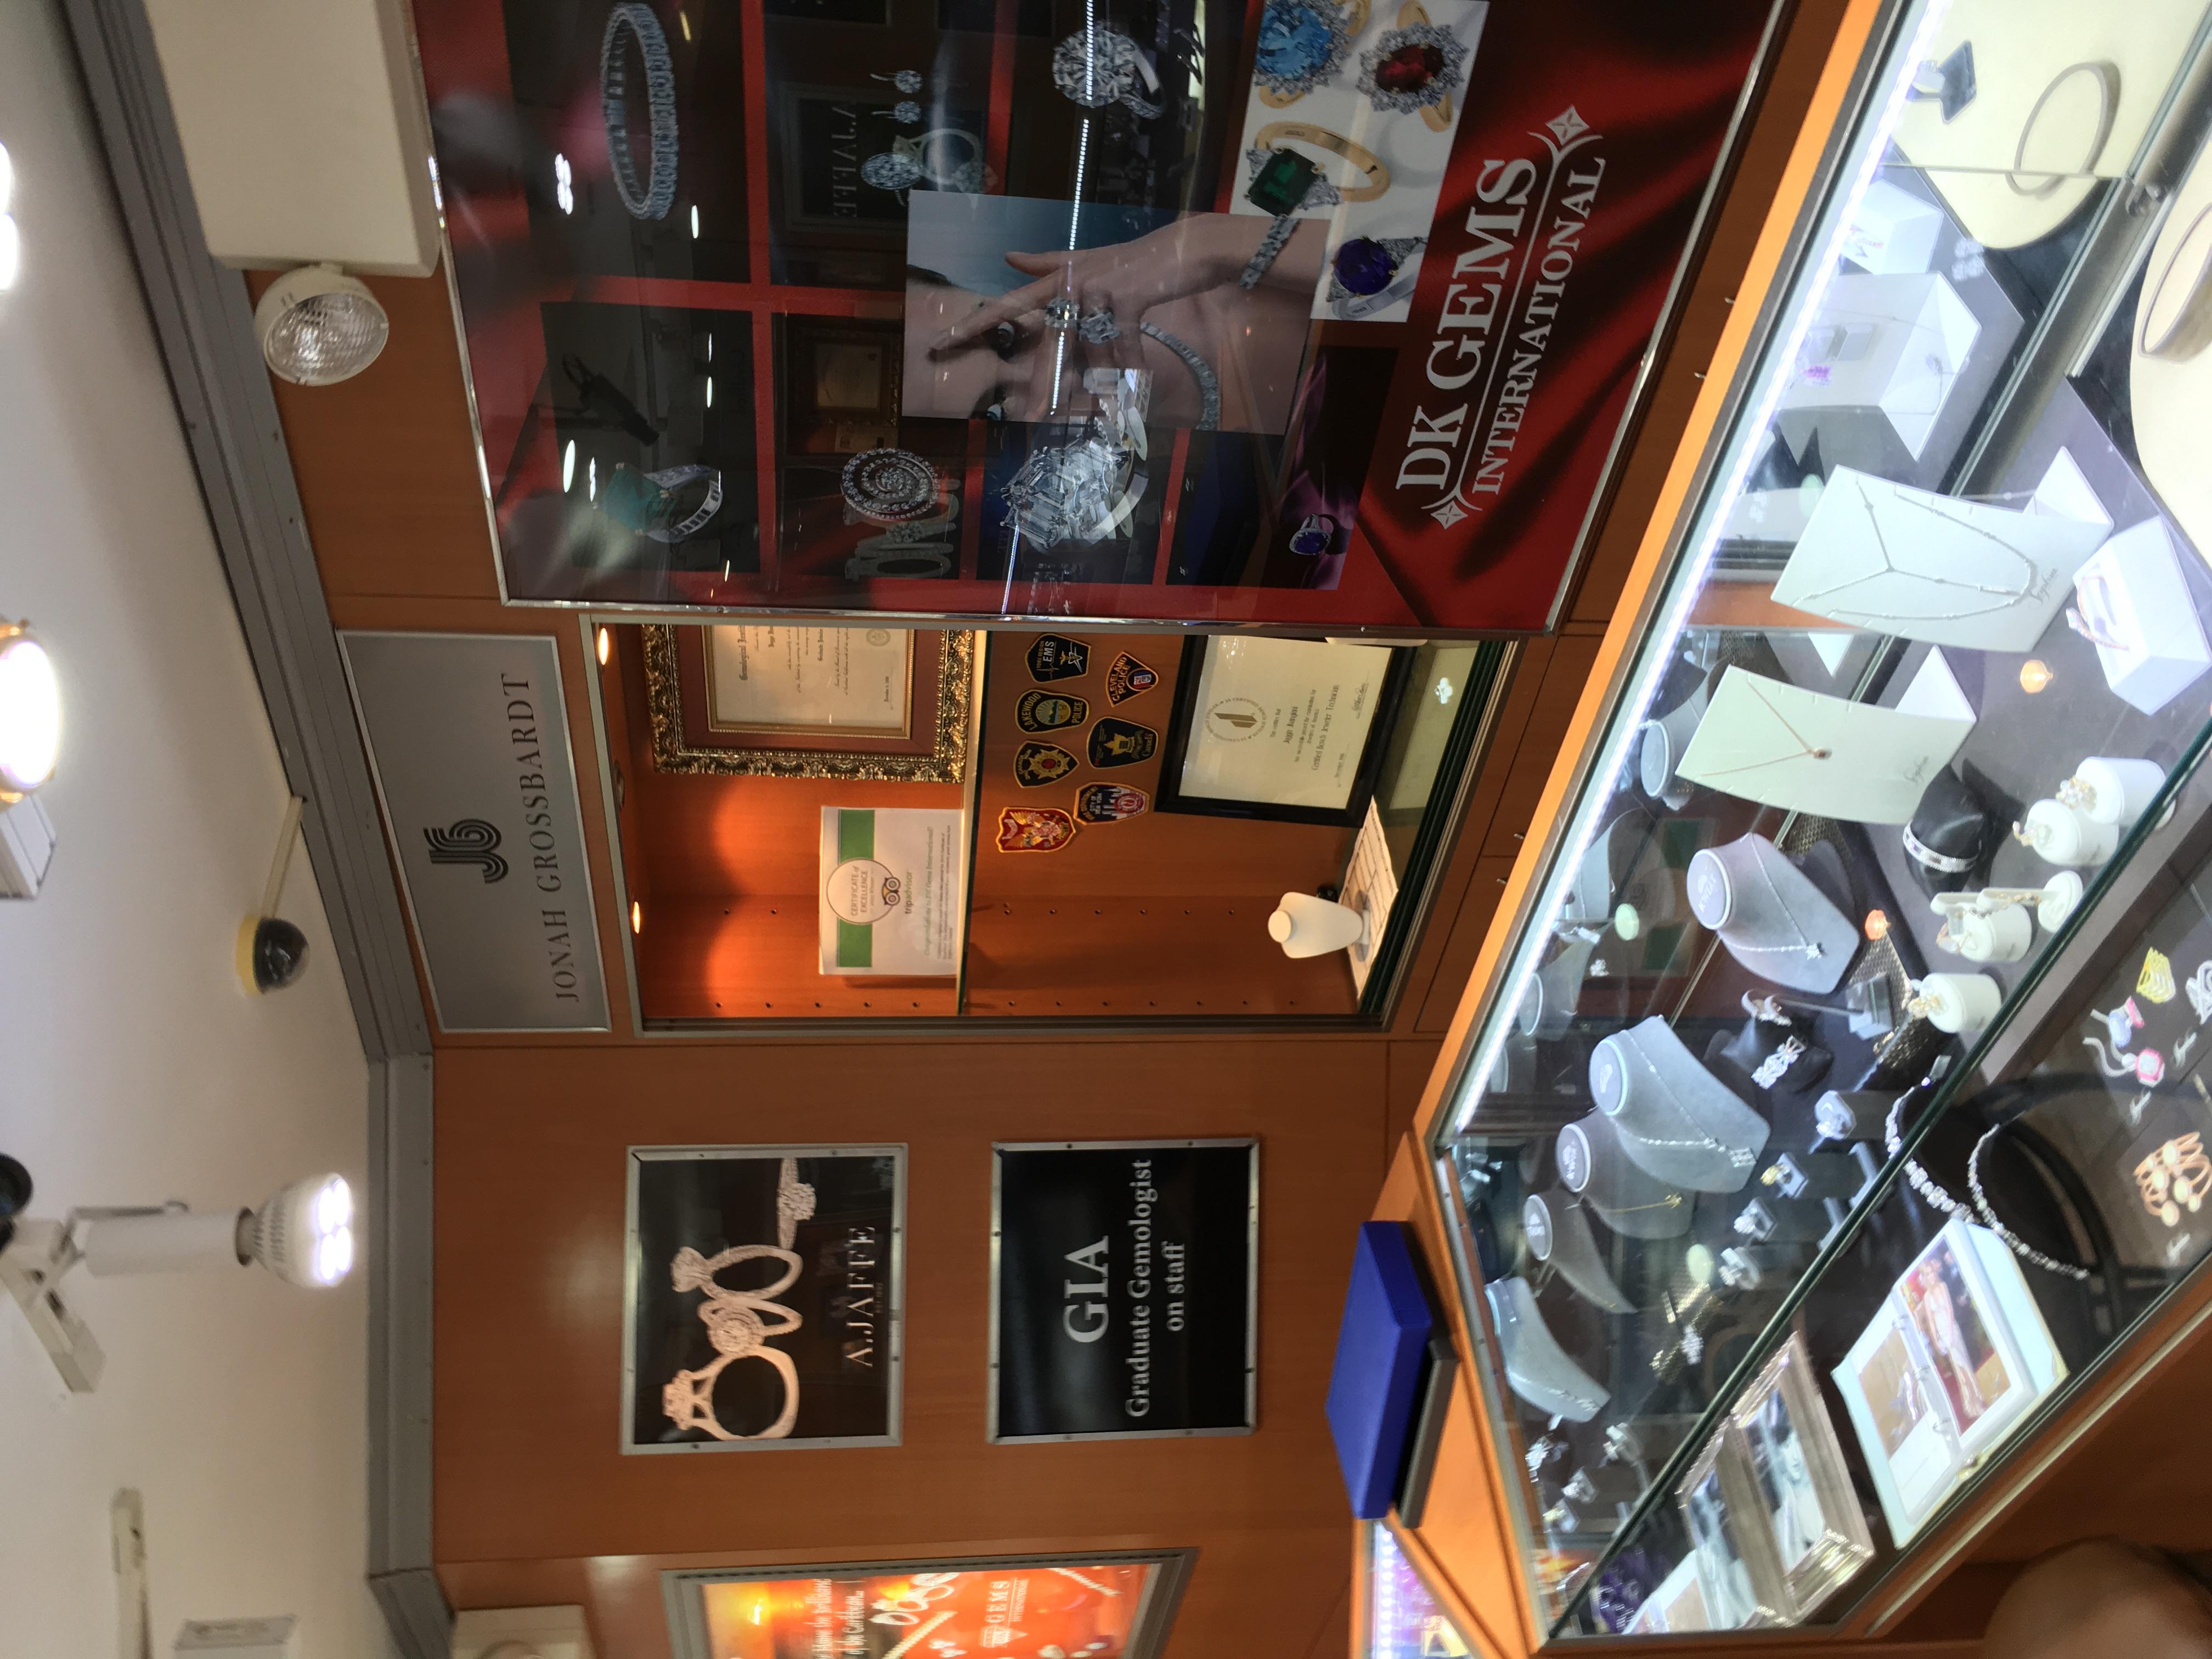 jewelry stores in st maarten Certificate of excellence fromTripadvisor for DK Gems BEST Sint Maarten Jewelry store